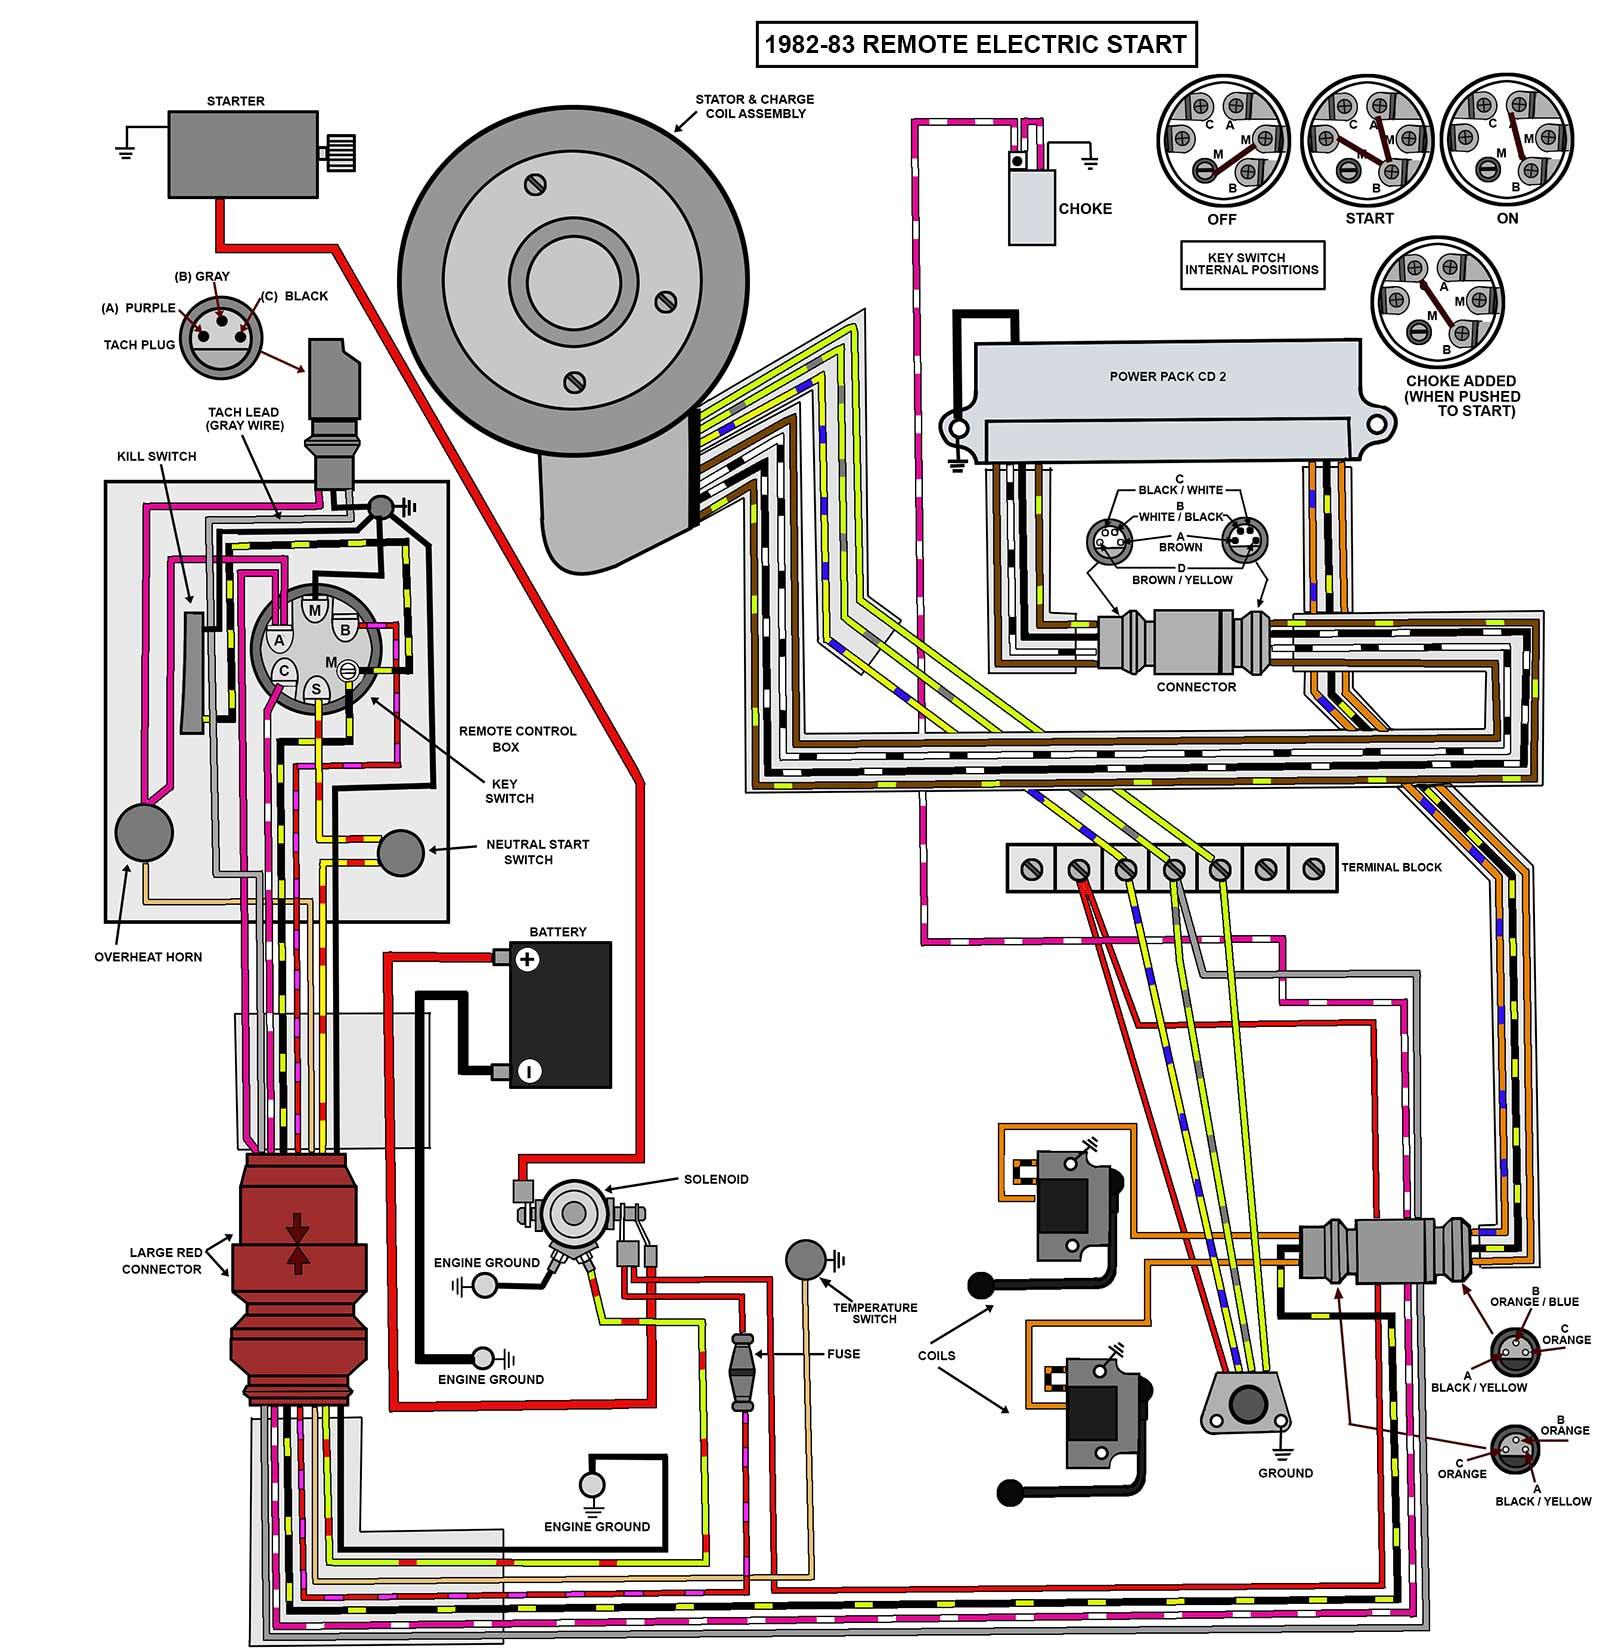 Honda Outboard Lower Unit Parts Diagram Motorwallpapers Org 1979 Evinrude  Wiring Diagram